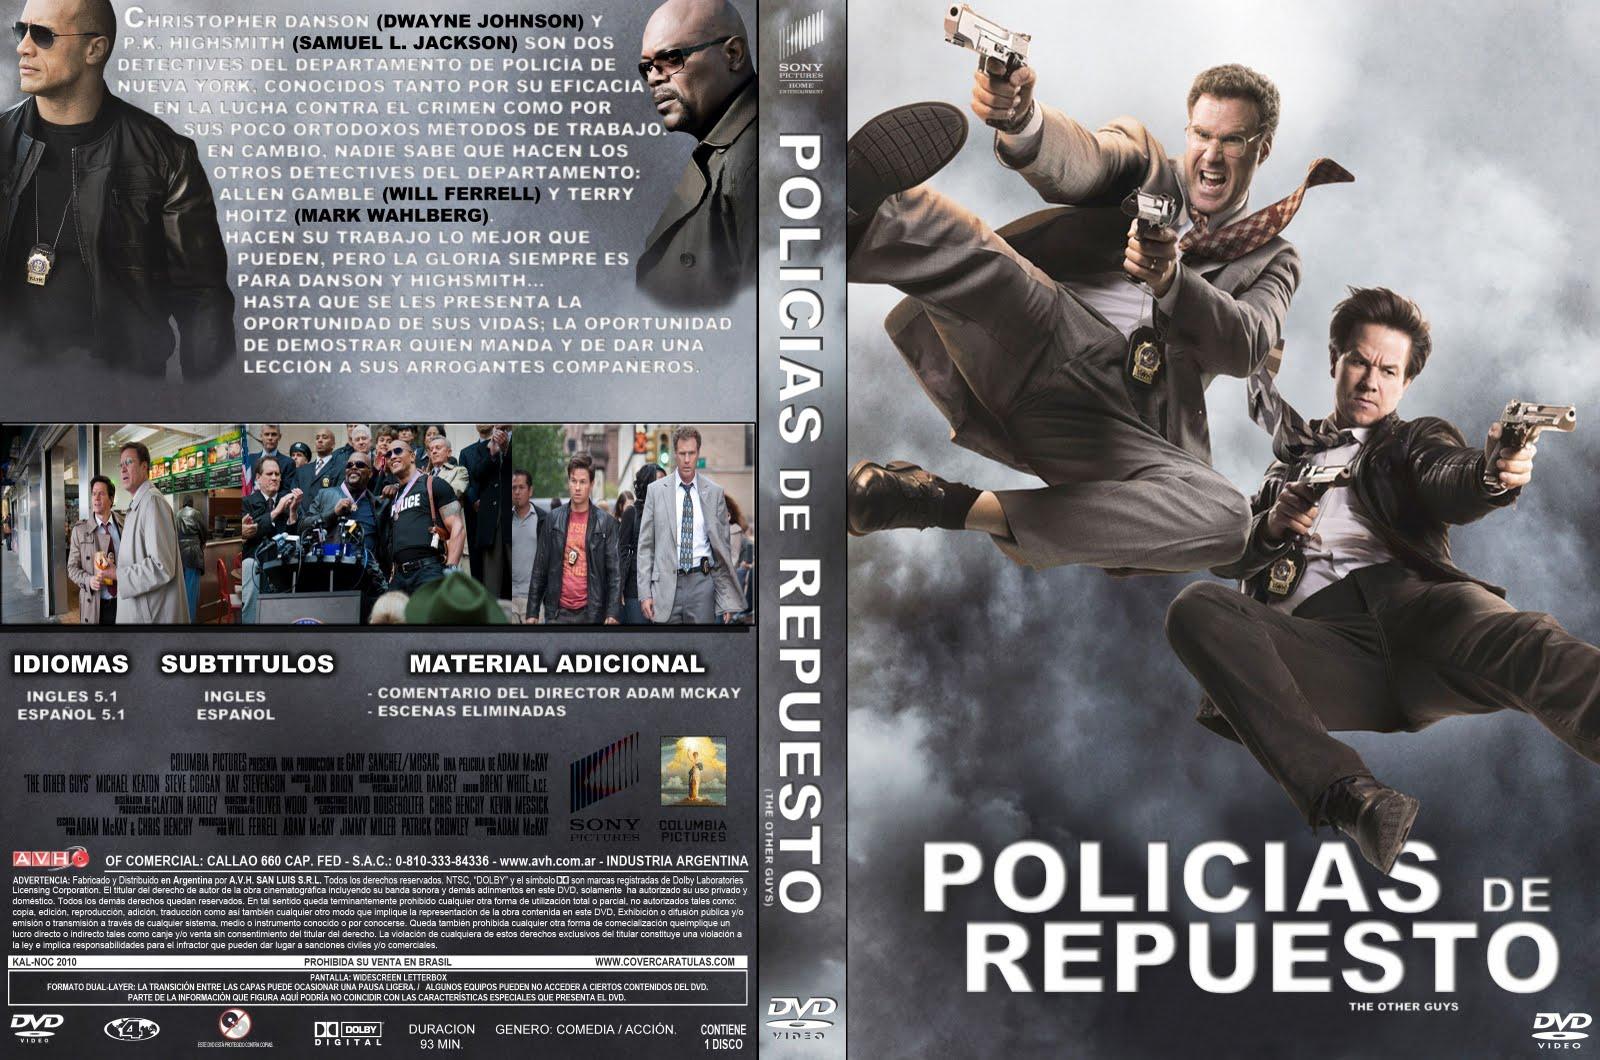 http://3.bp.blogspot.com/-0BIpxLFhMnM/T4OYg4e8BxI/AAAAAAAAAHg/Iwp4ihOOhLo/s1600/Policias_De_Repuesto_-_Custom_por_kal-noc_%5Bdvd%5D_80.jpg